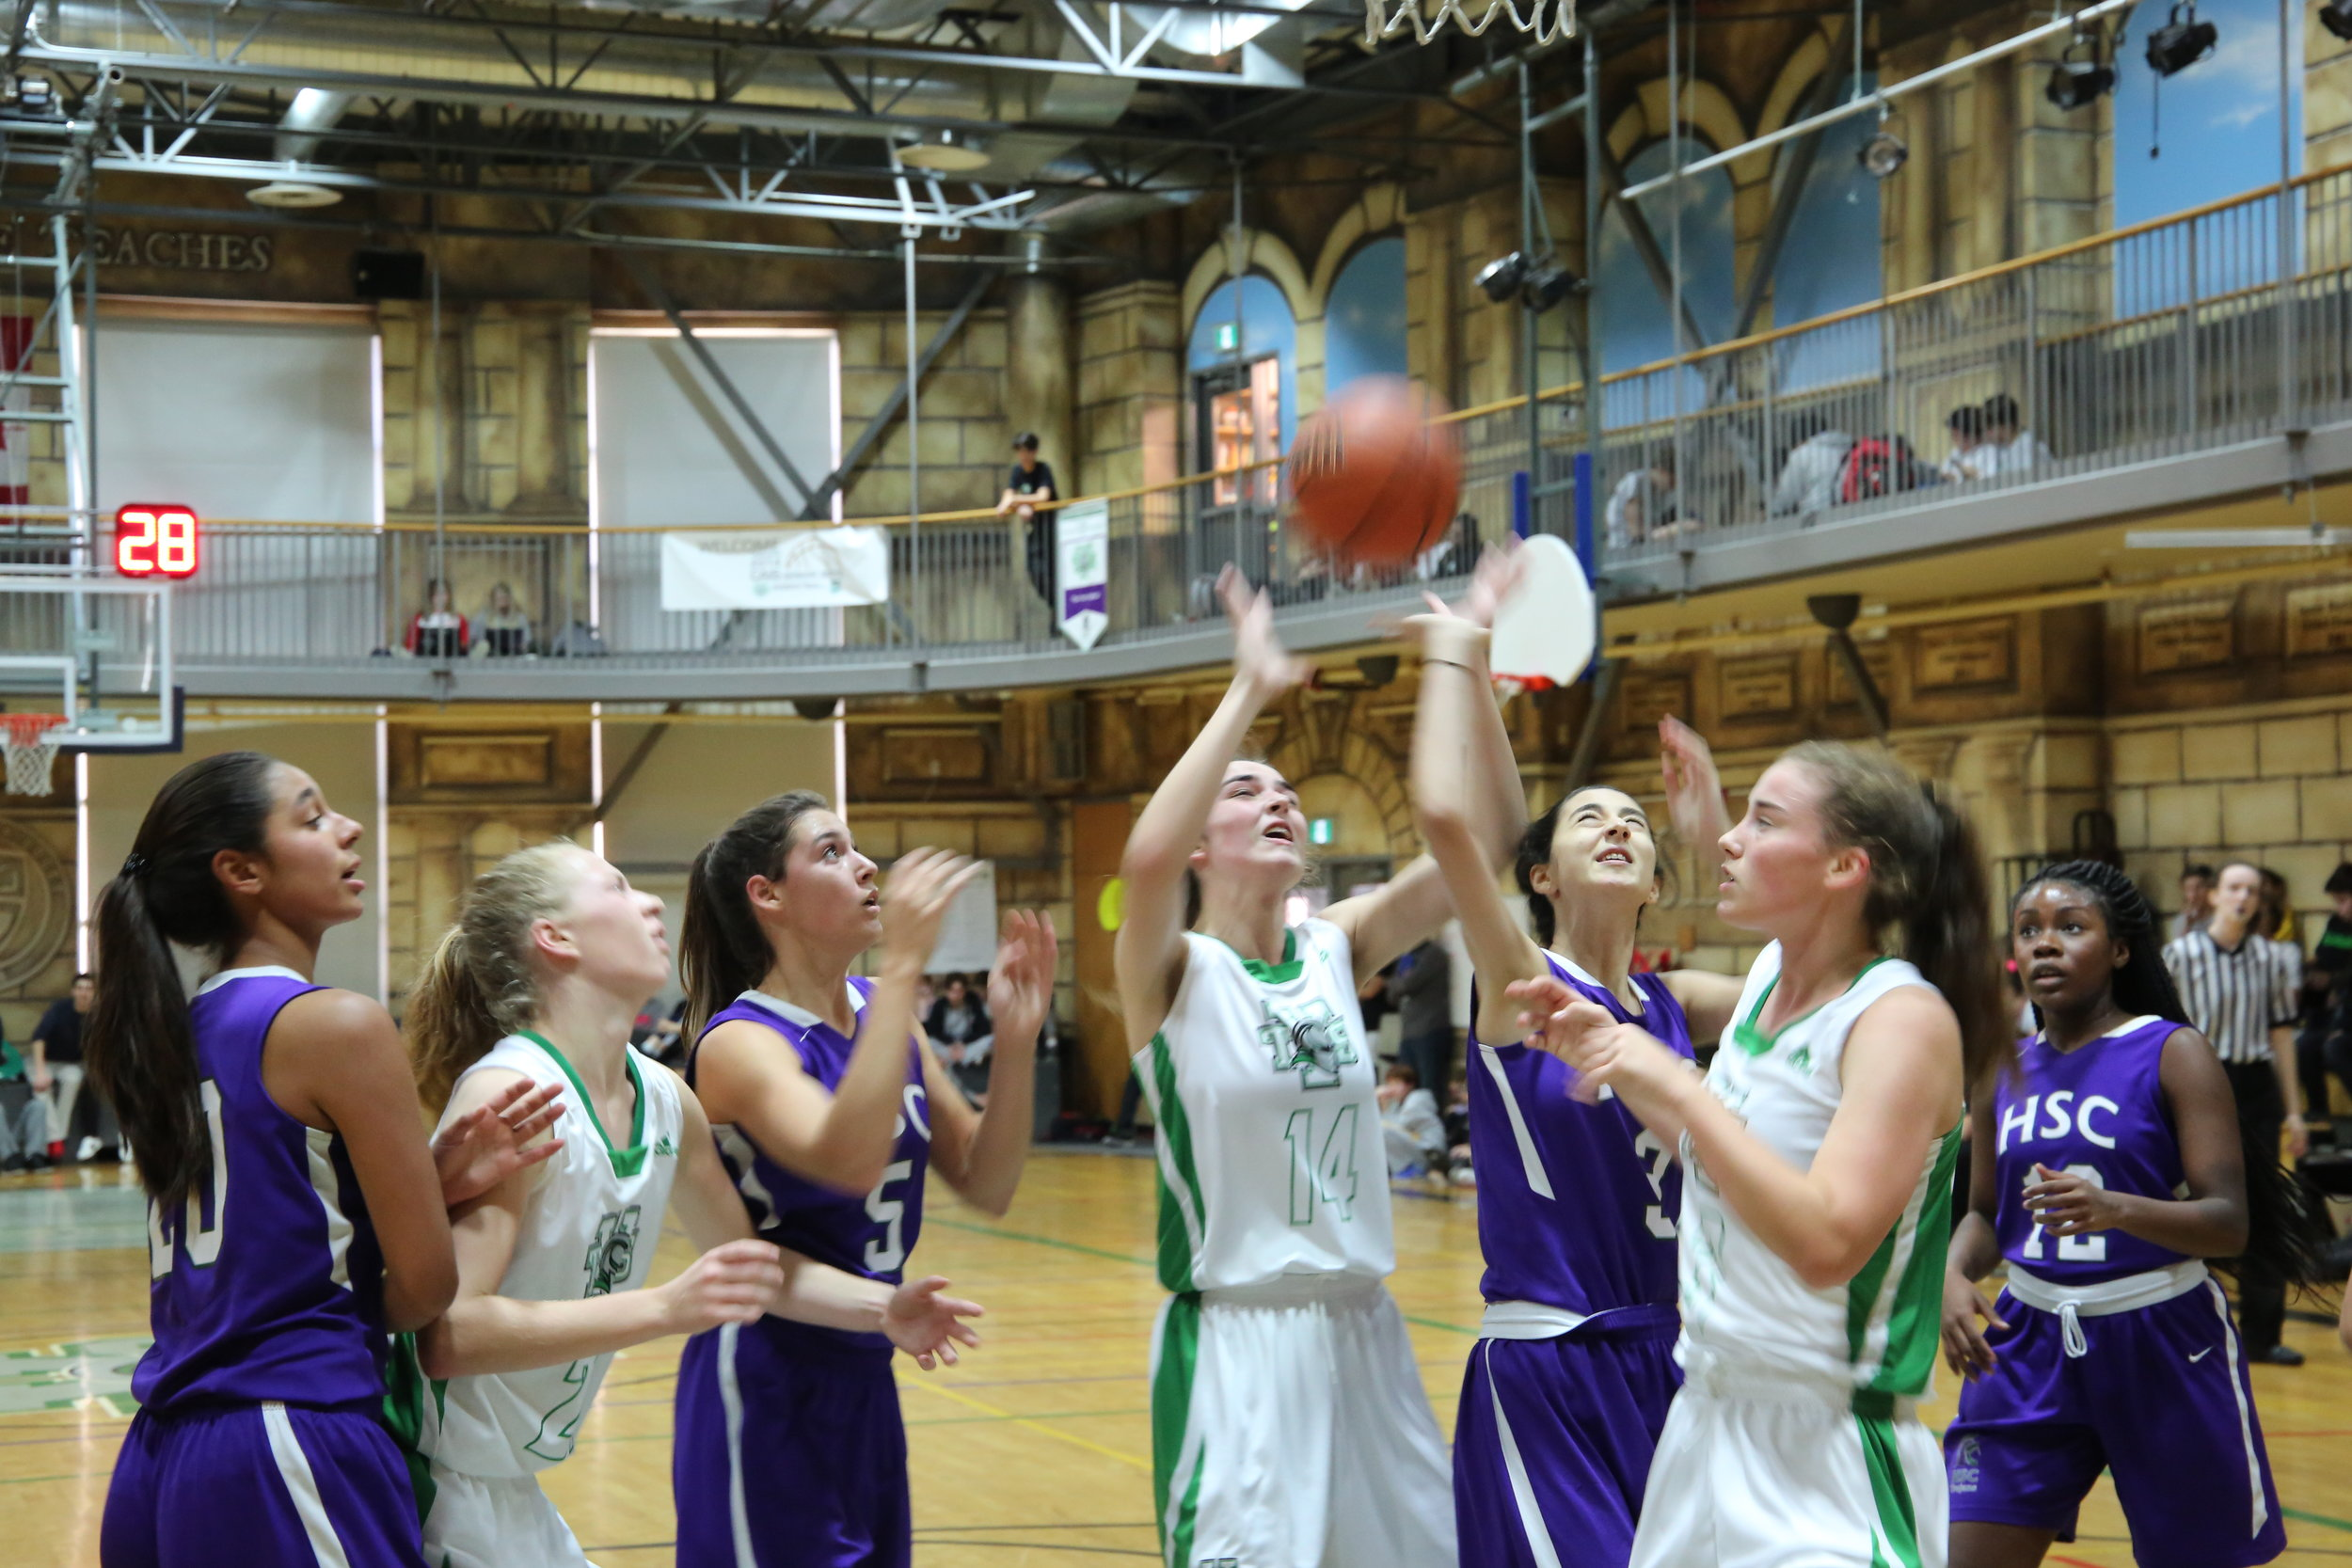 Our Varsity Girls' Basketball team on the court.